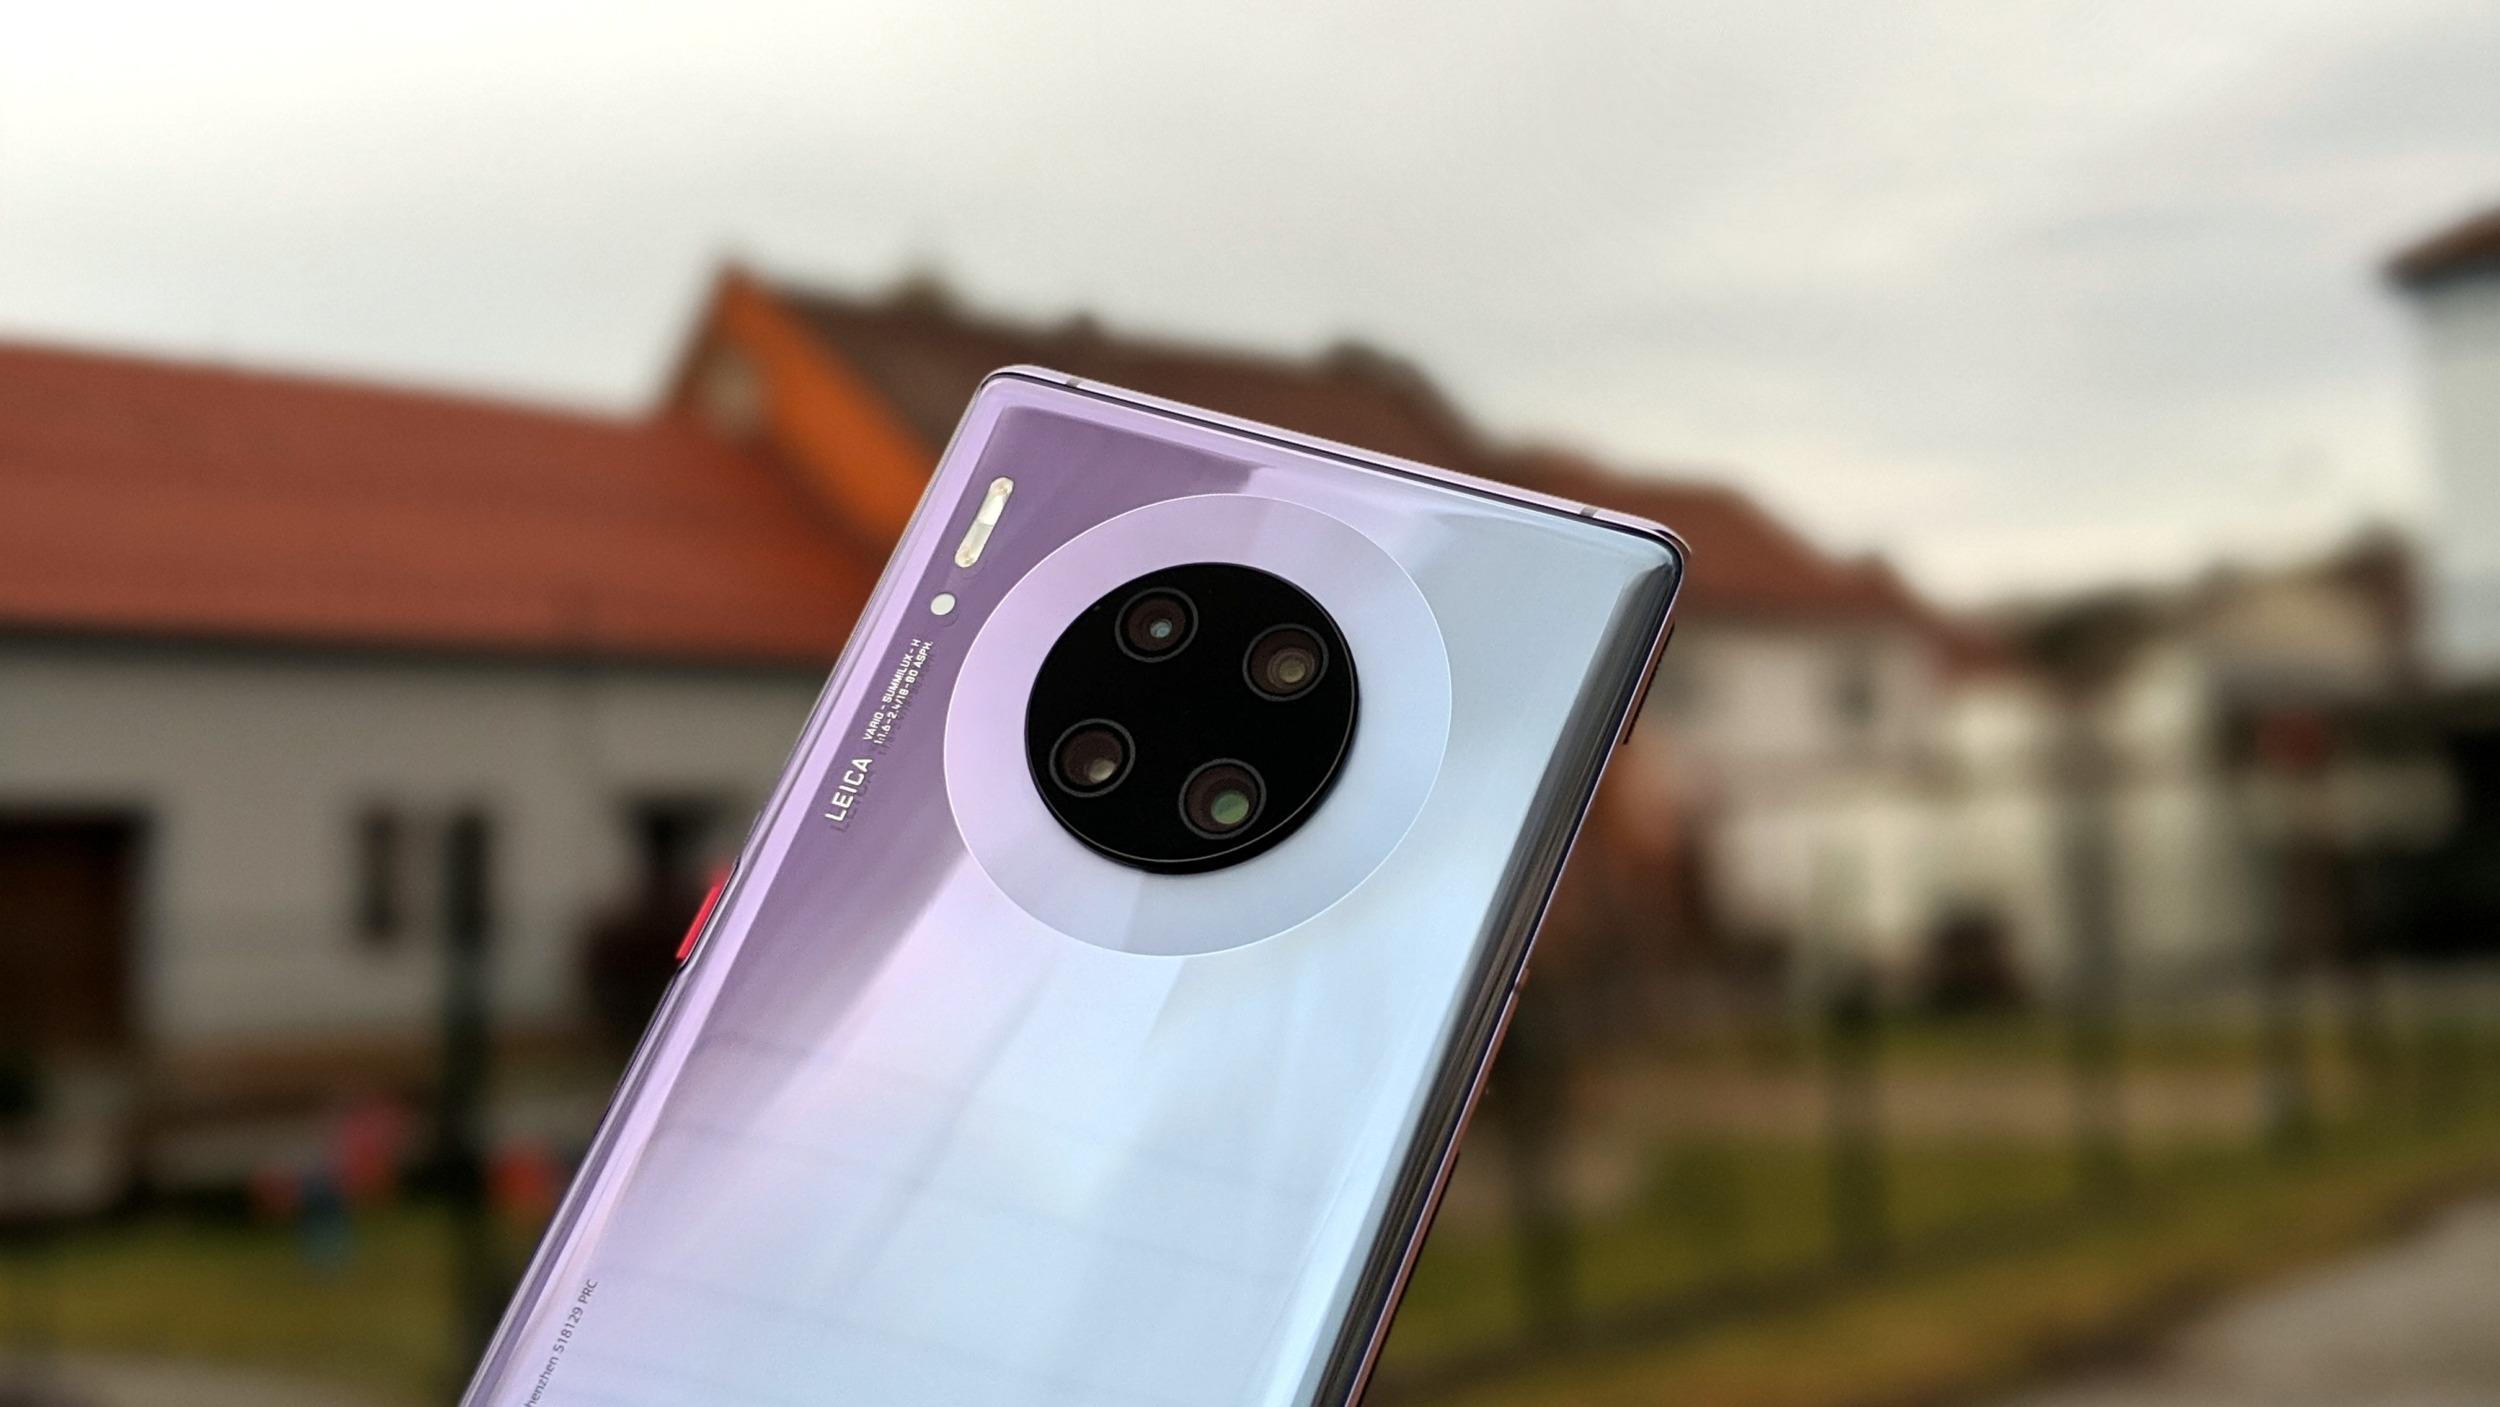 Google varuje, neinstalujte GMS na Huawei mobily